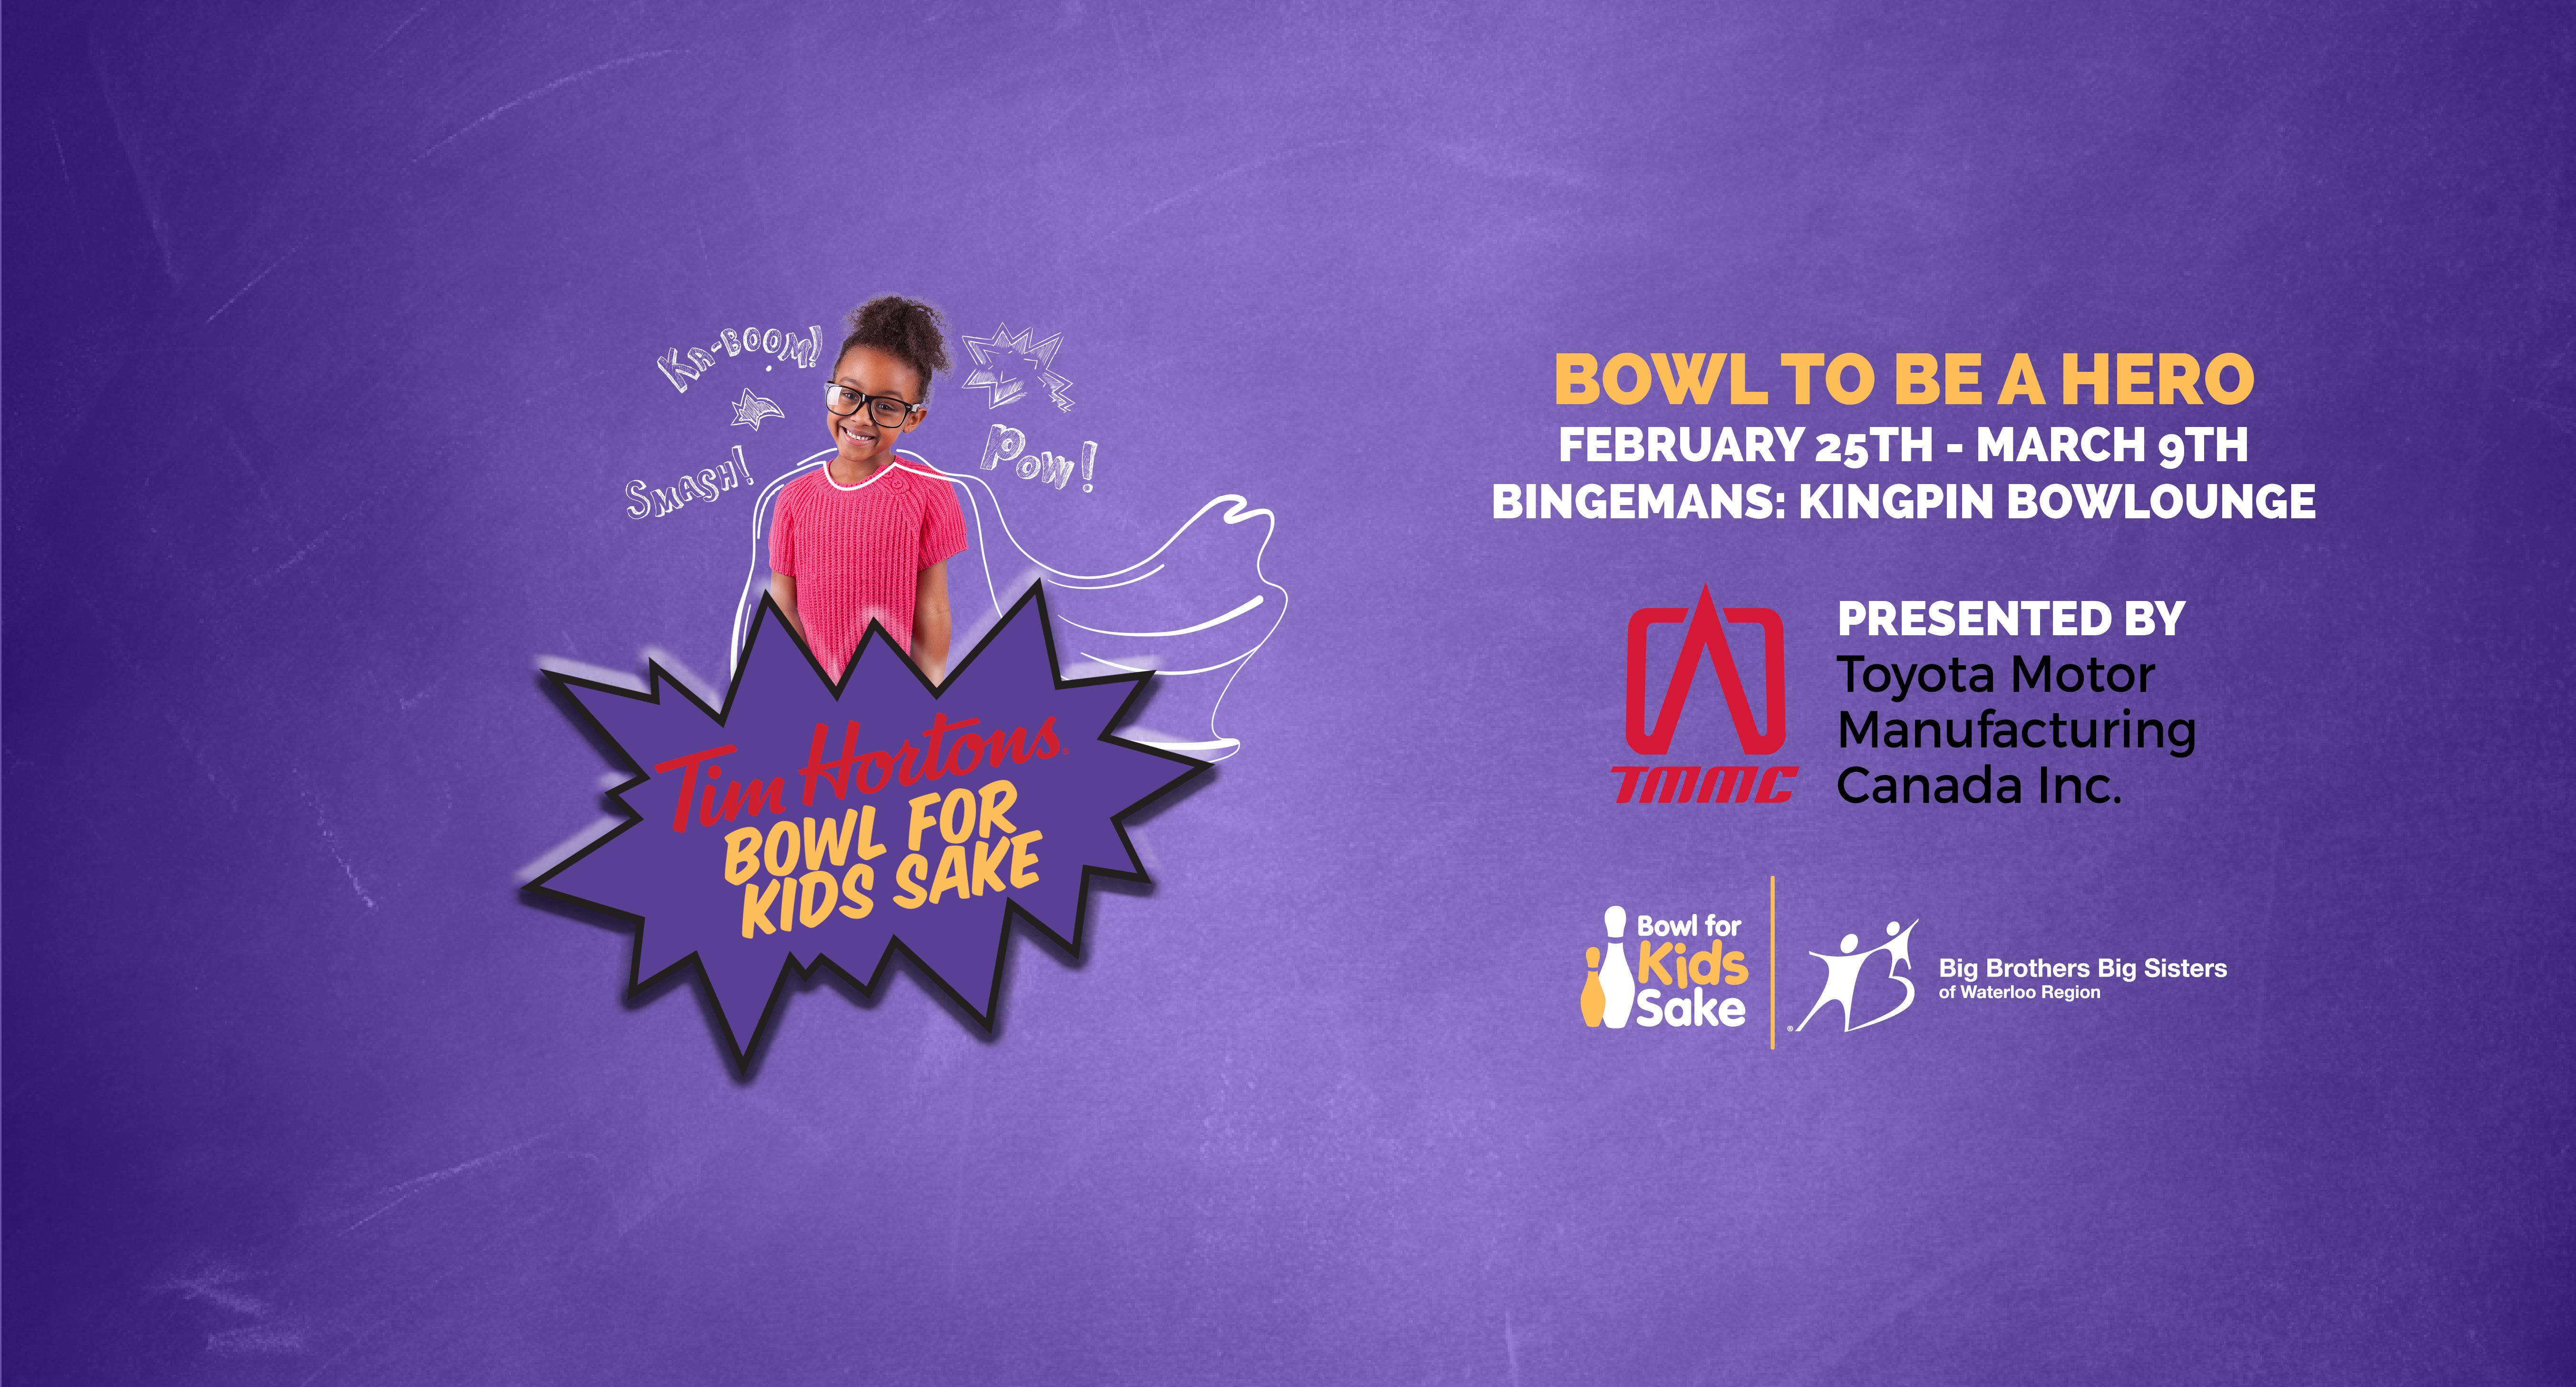 Web Banner - Bowl for Kids Sake 2019